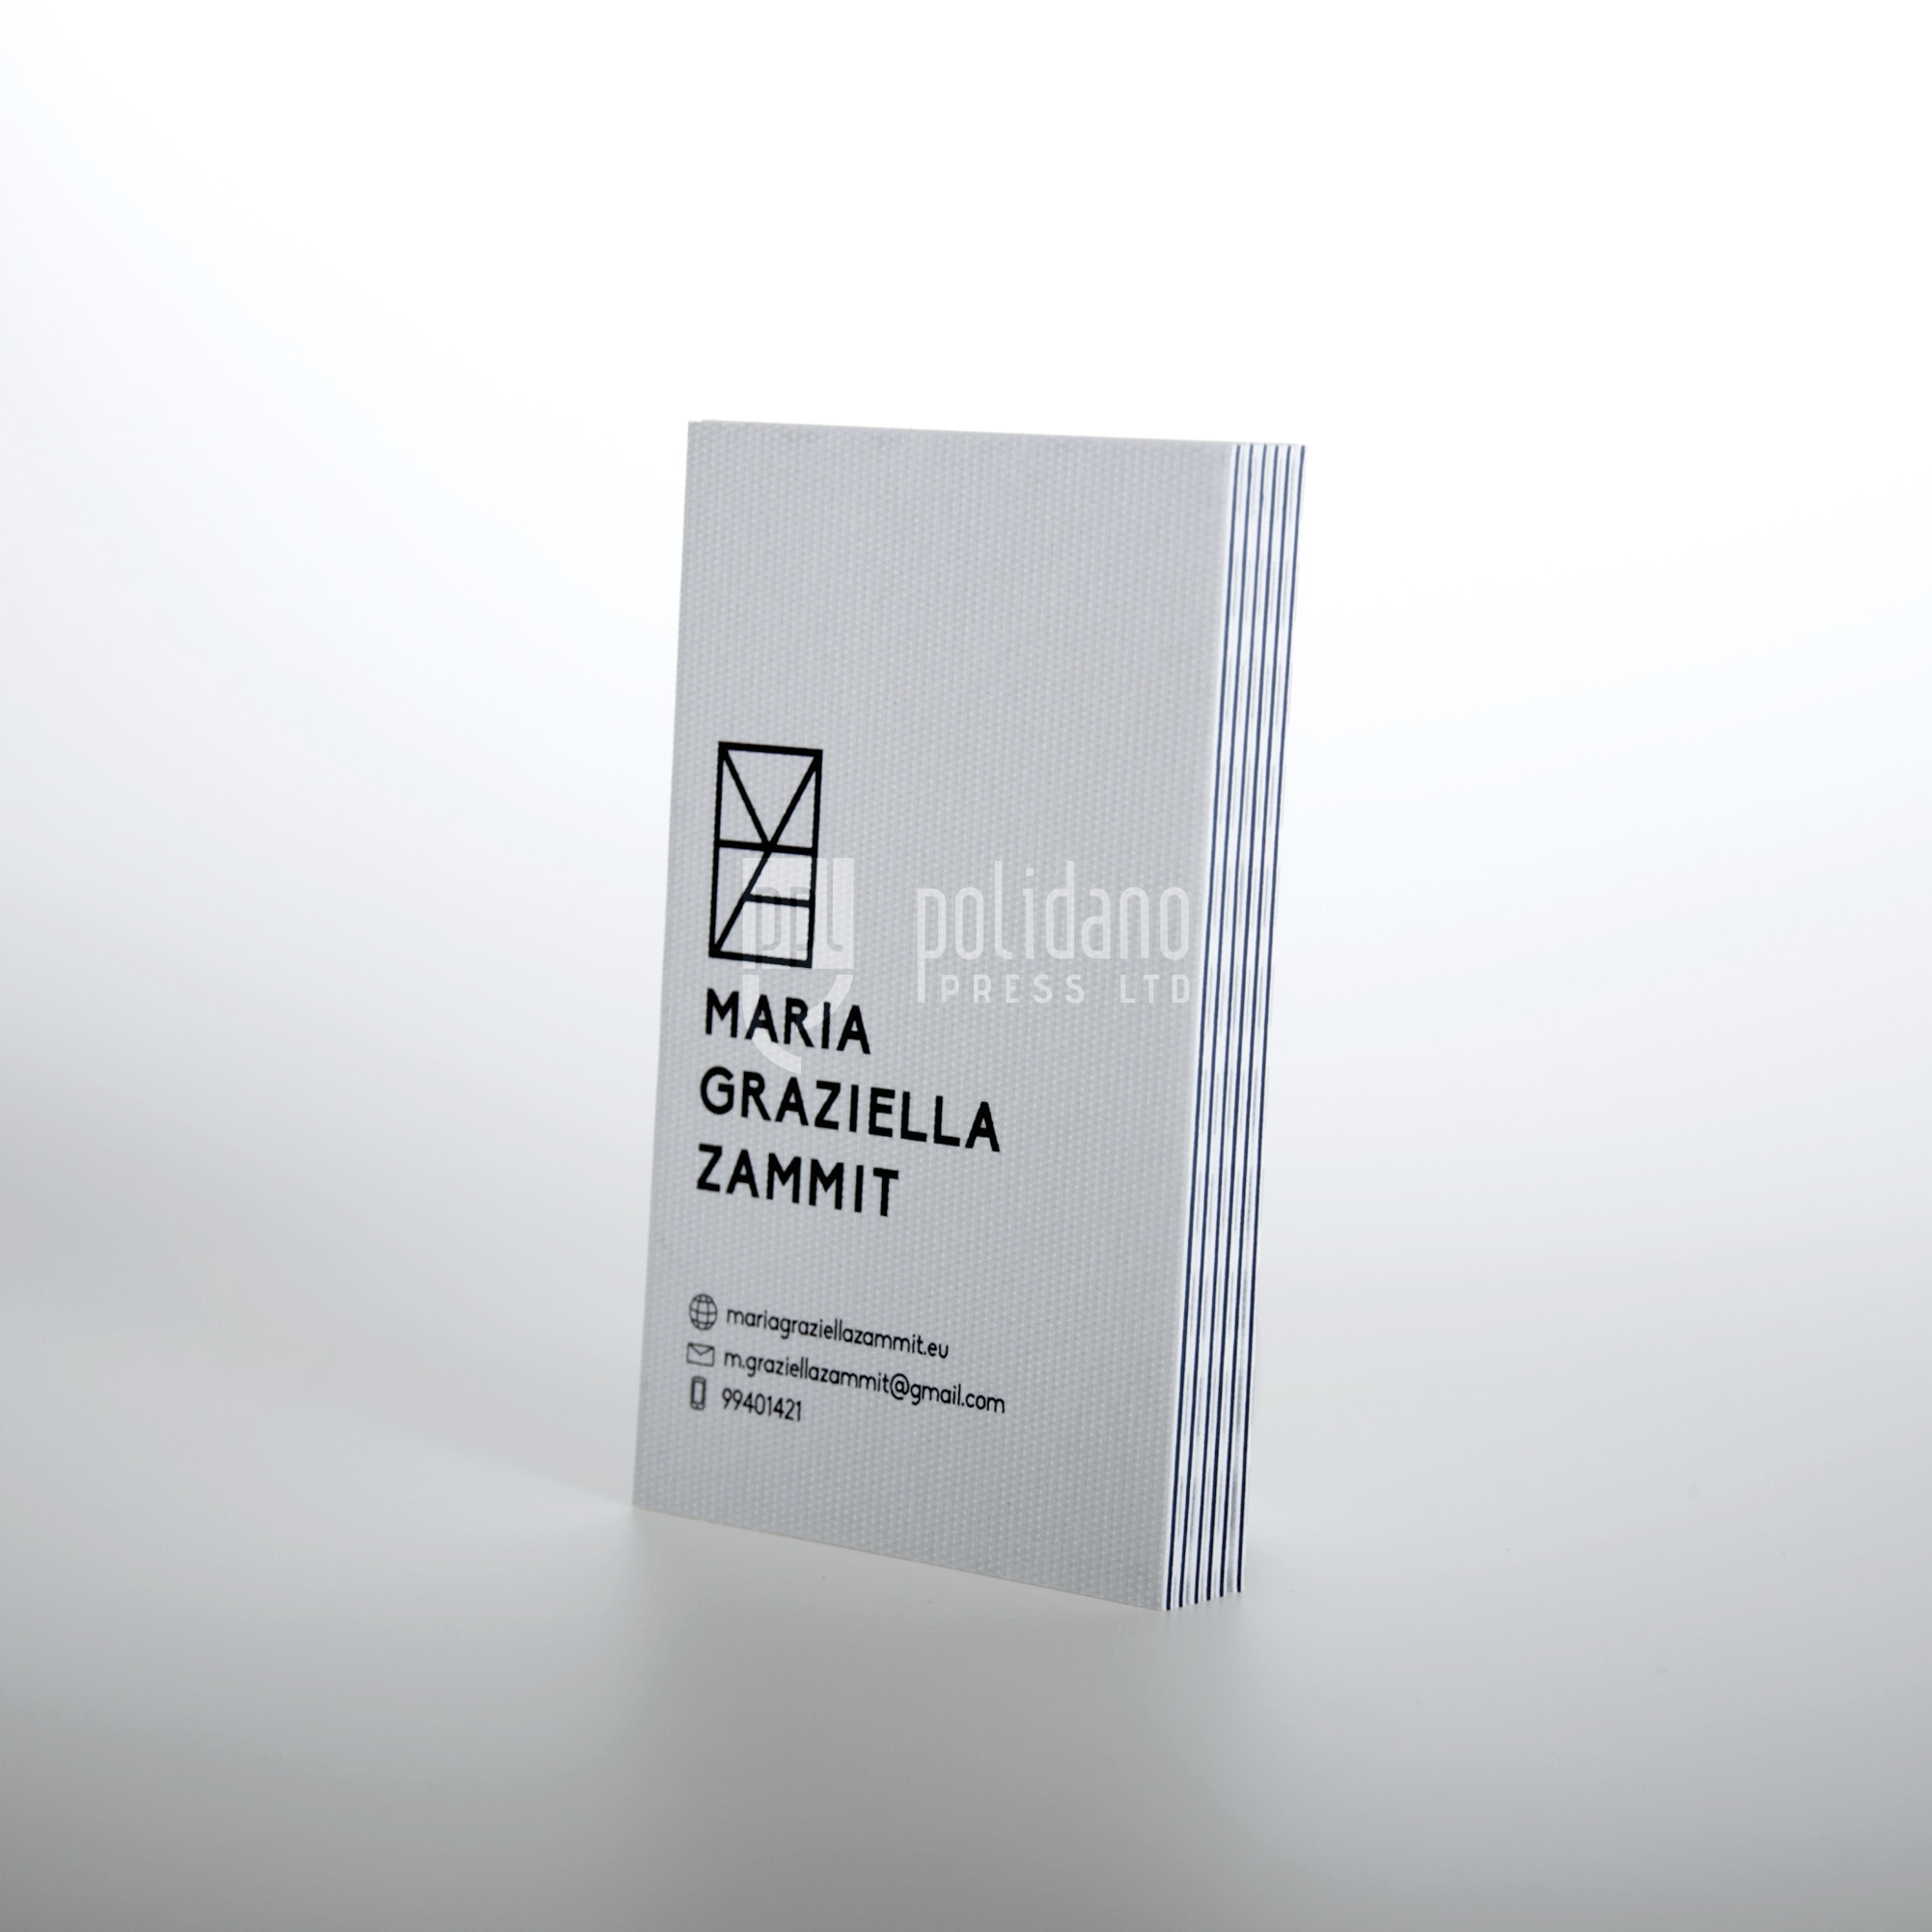 Maria Graziella Zammit business card